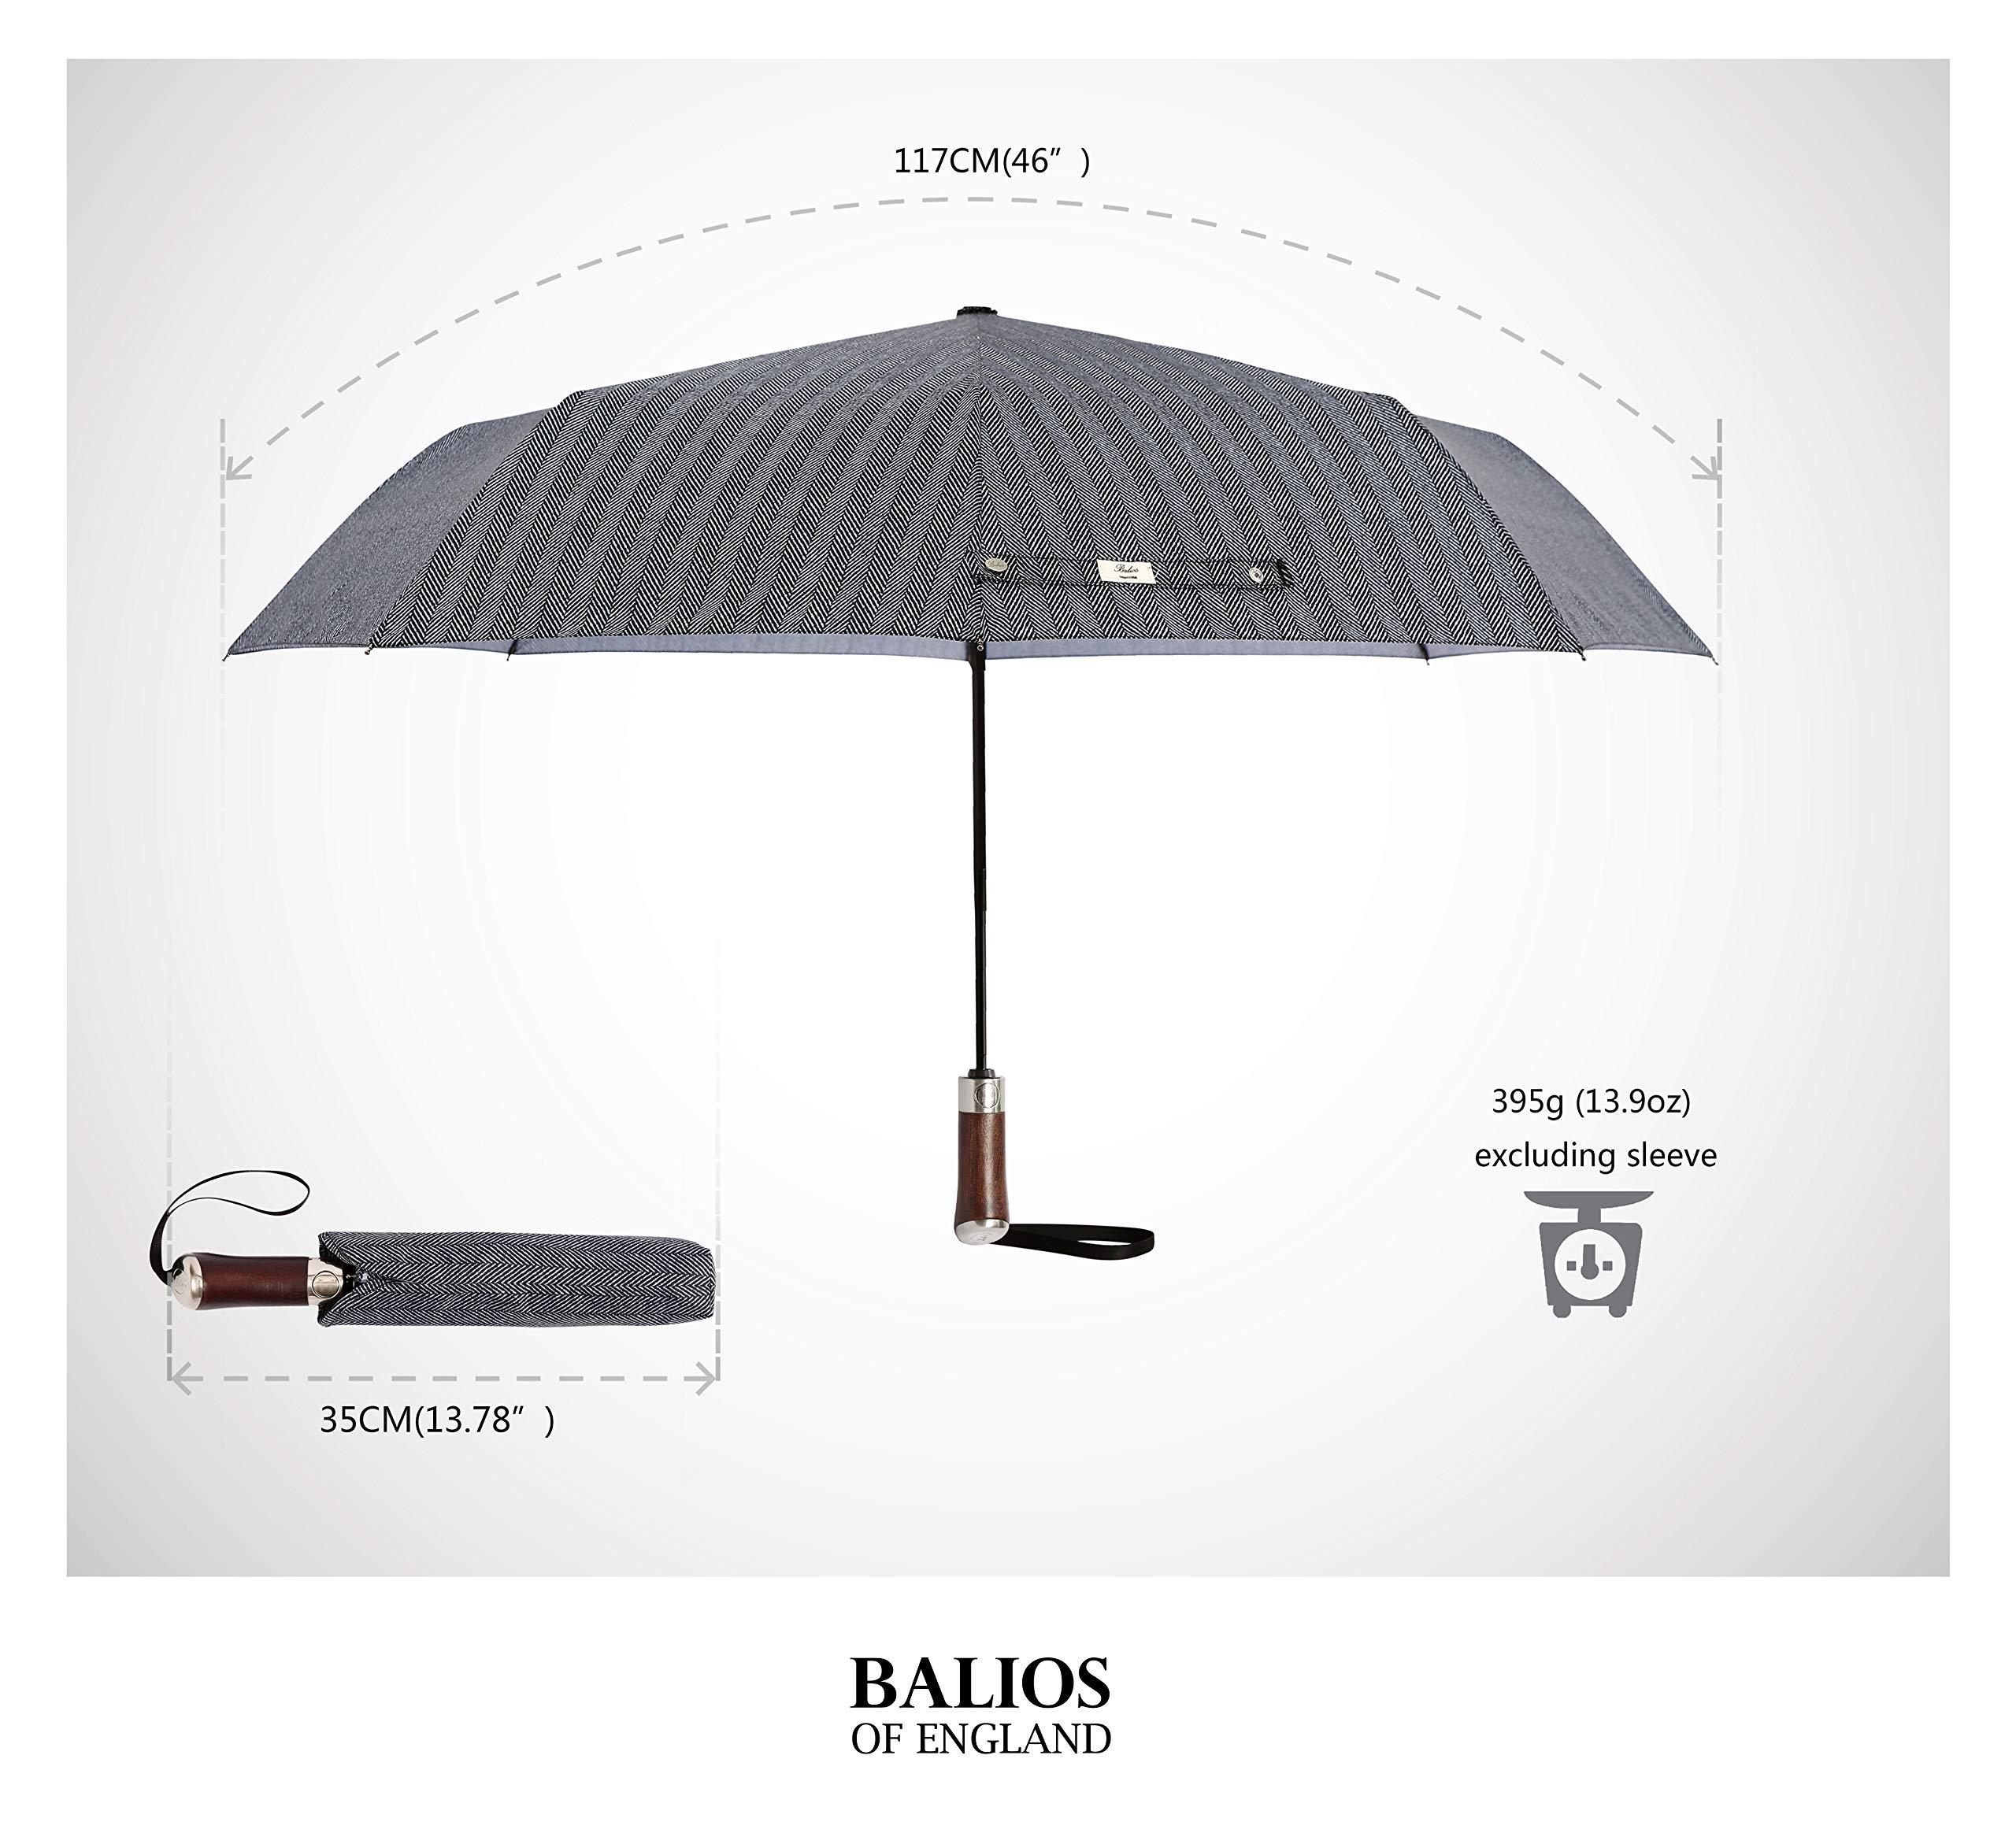 Open 46 Inch Black Folding Umbrellas Windproof Automatic Fast Drying Travel Umbrella 210T Double Canopy Real Wood Handle 10 Ribs Fiberglass